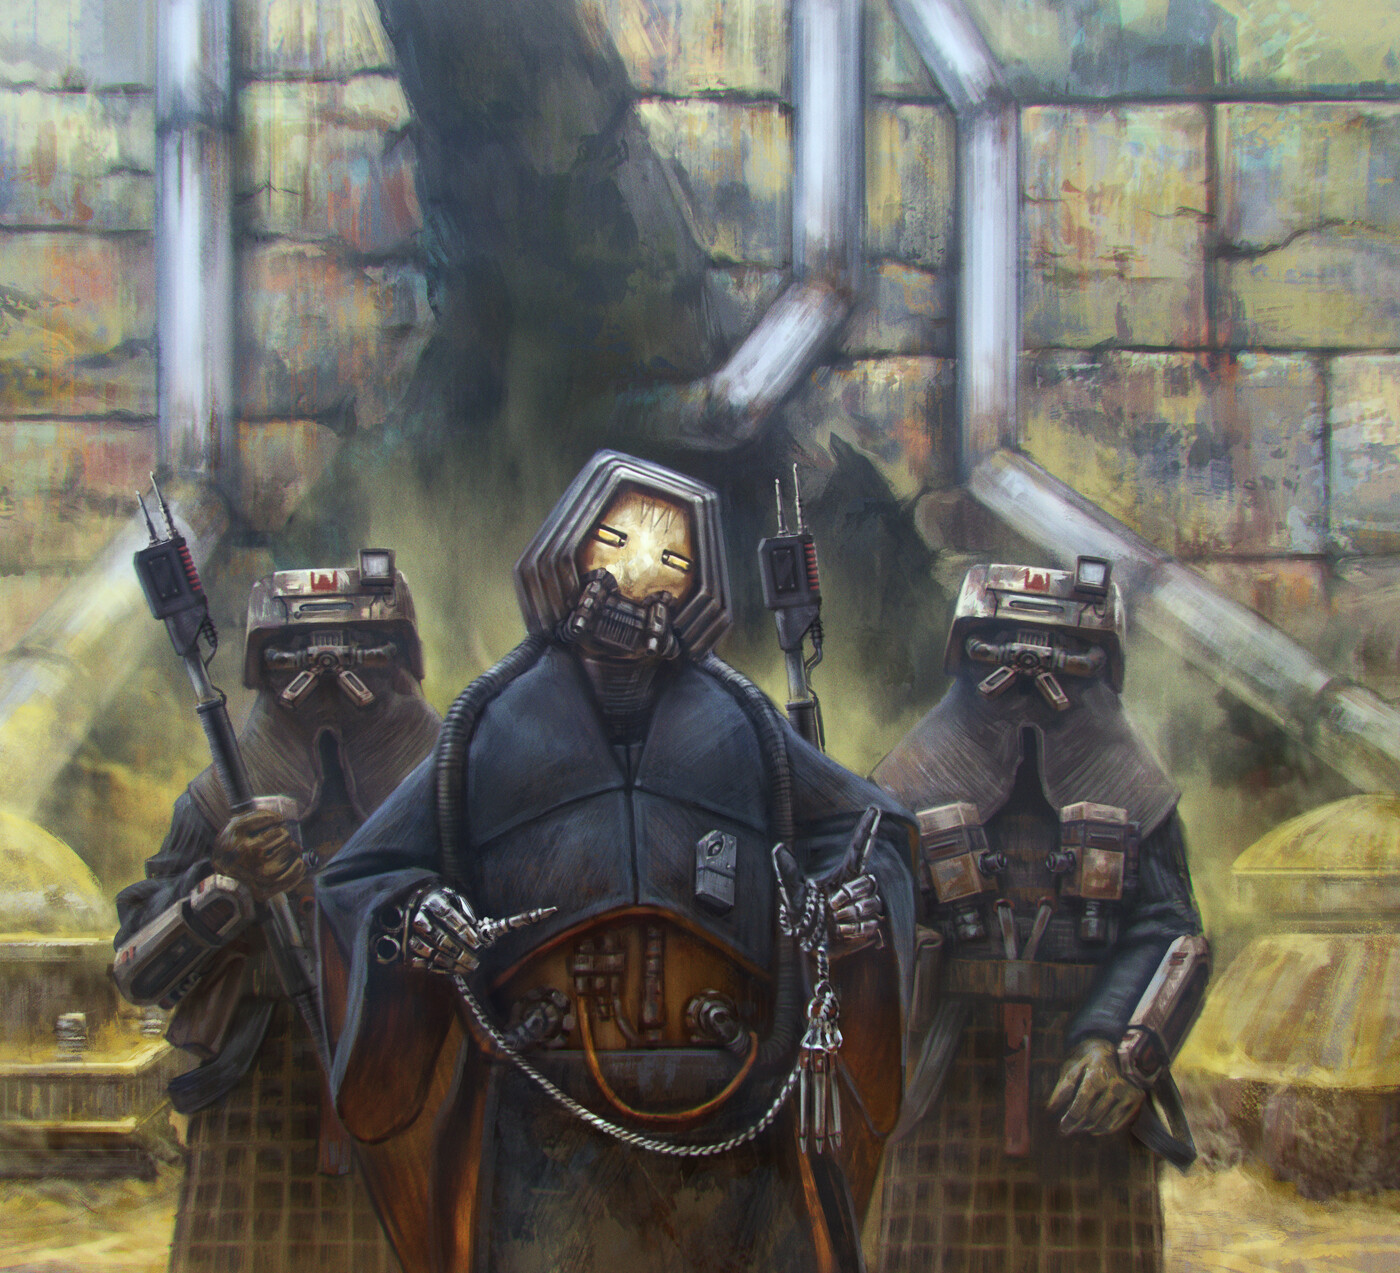 Quay Tolsite | Star Wars Destiny